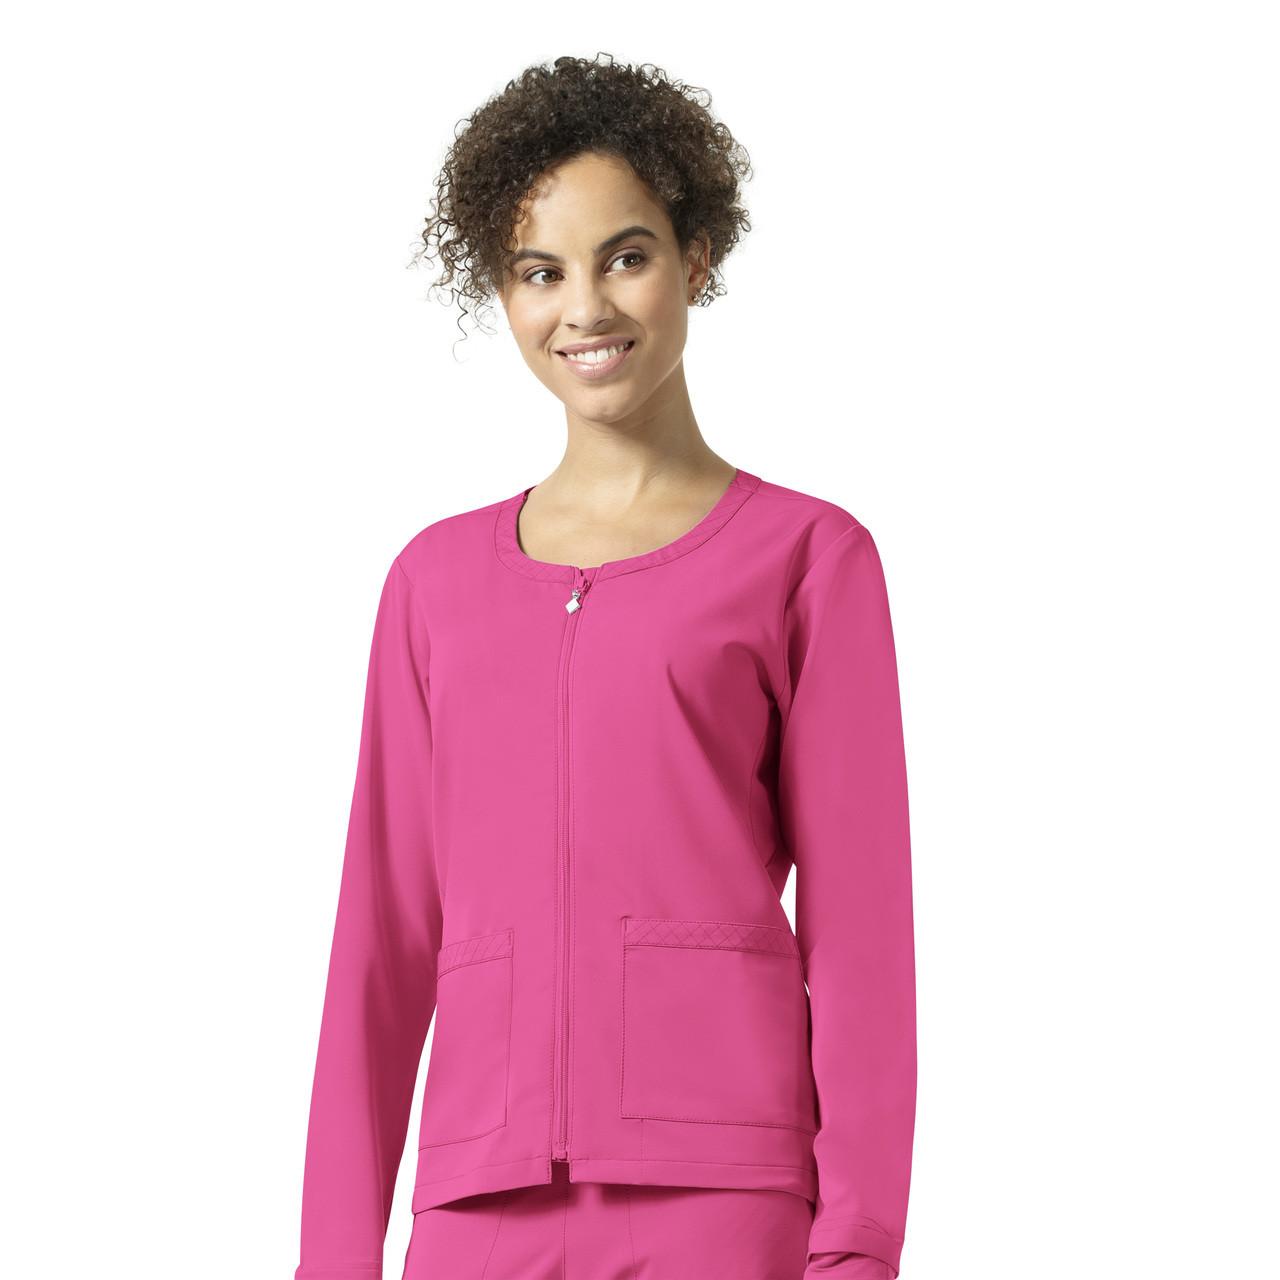 (V8109) Vera Bradley Halo Julia Zip Front Quilted Warm Up Jacket